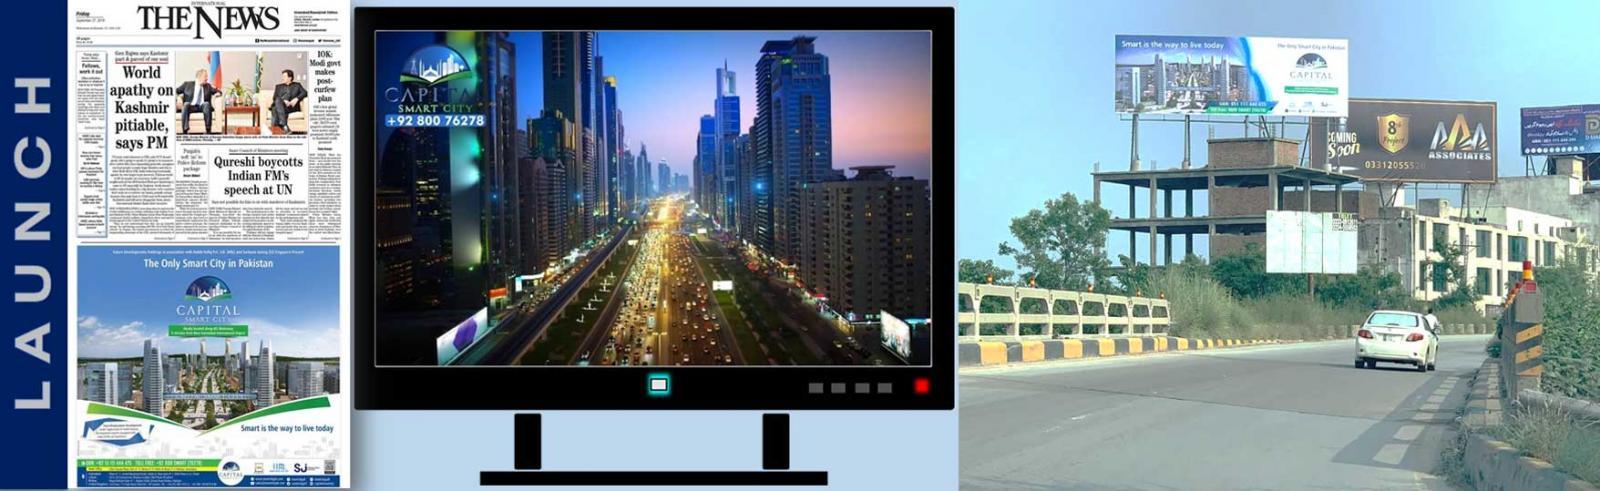 Now Launching Capital Smart City